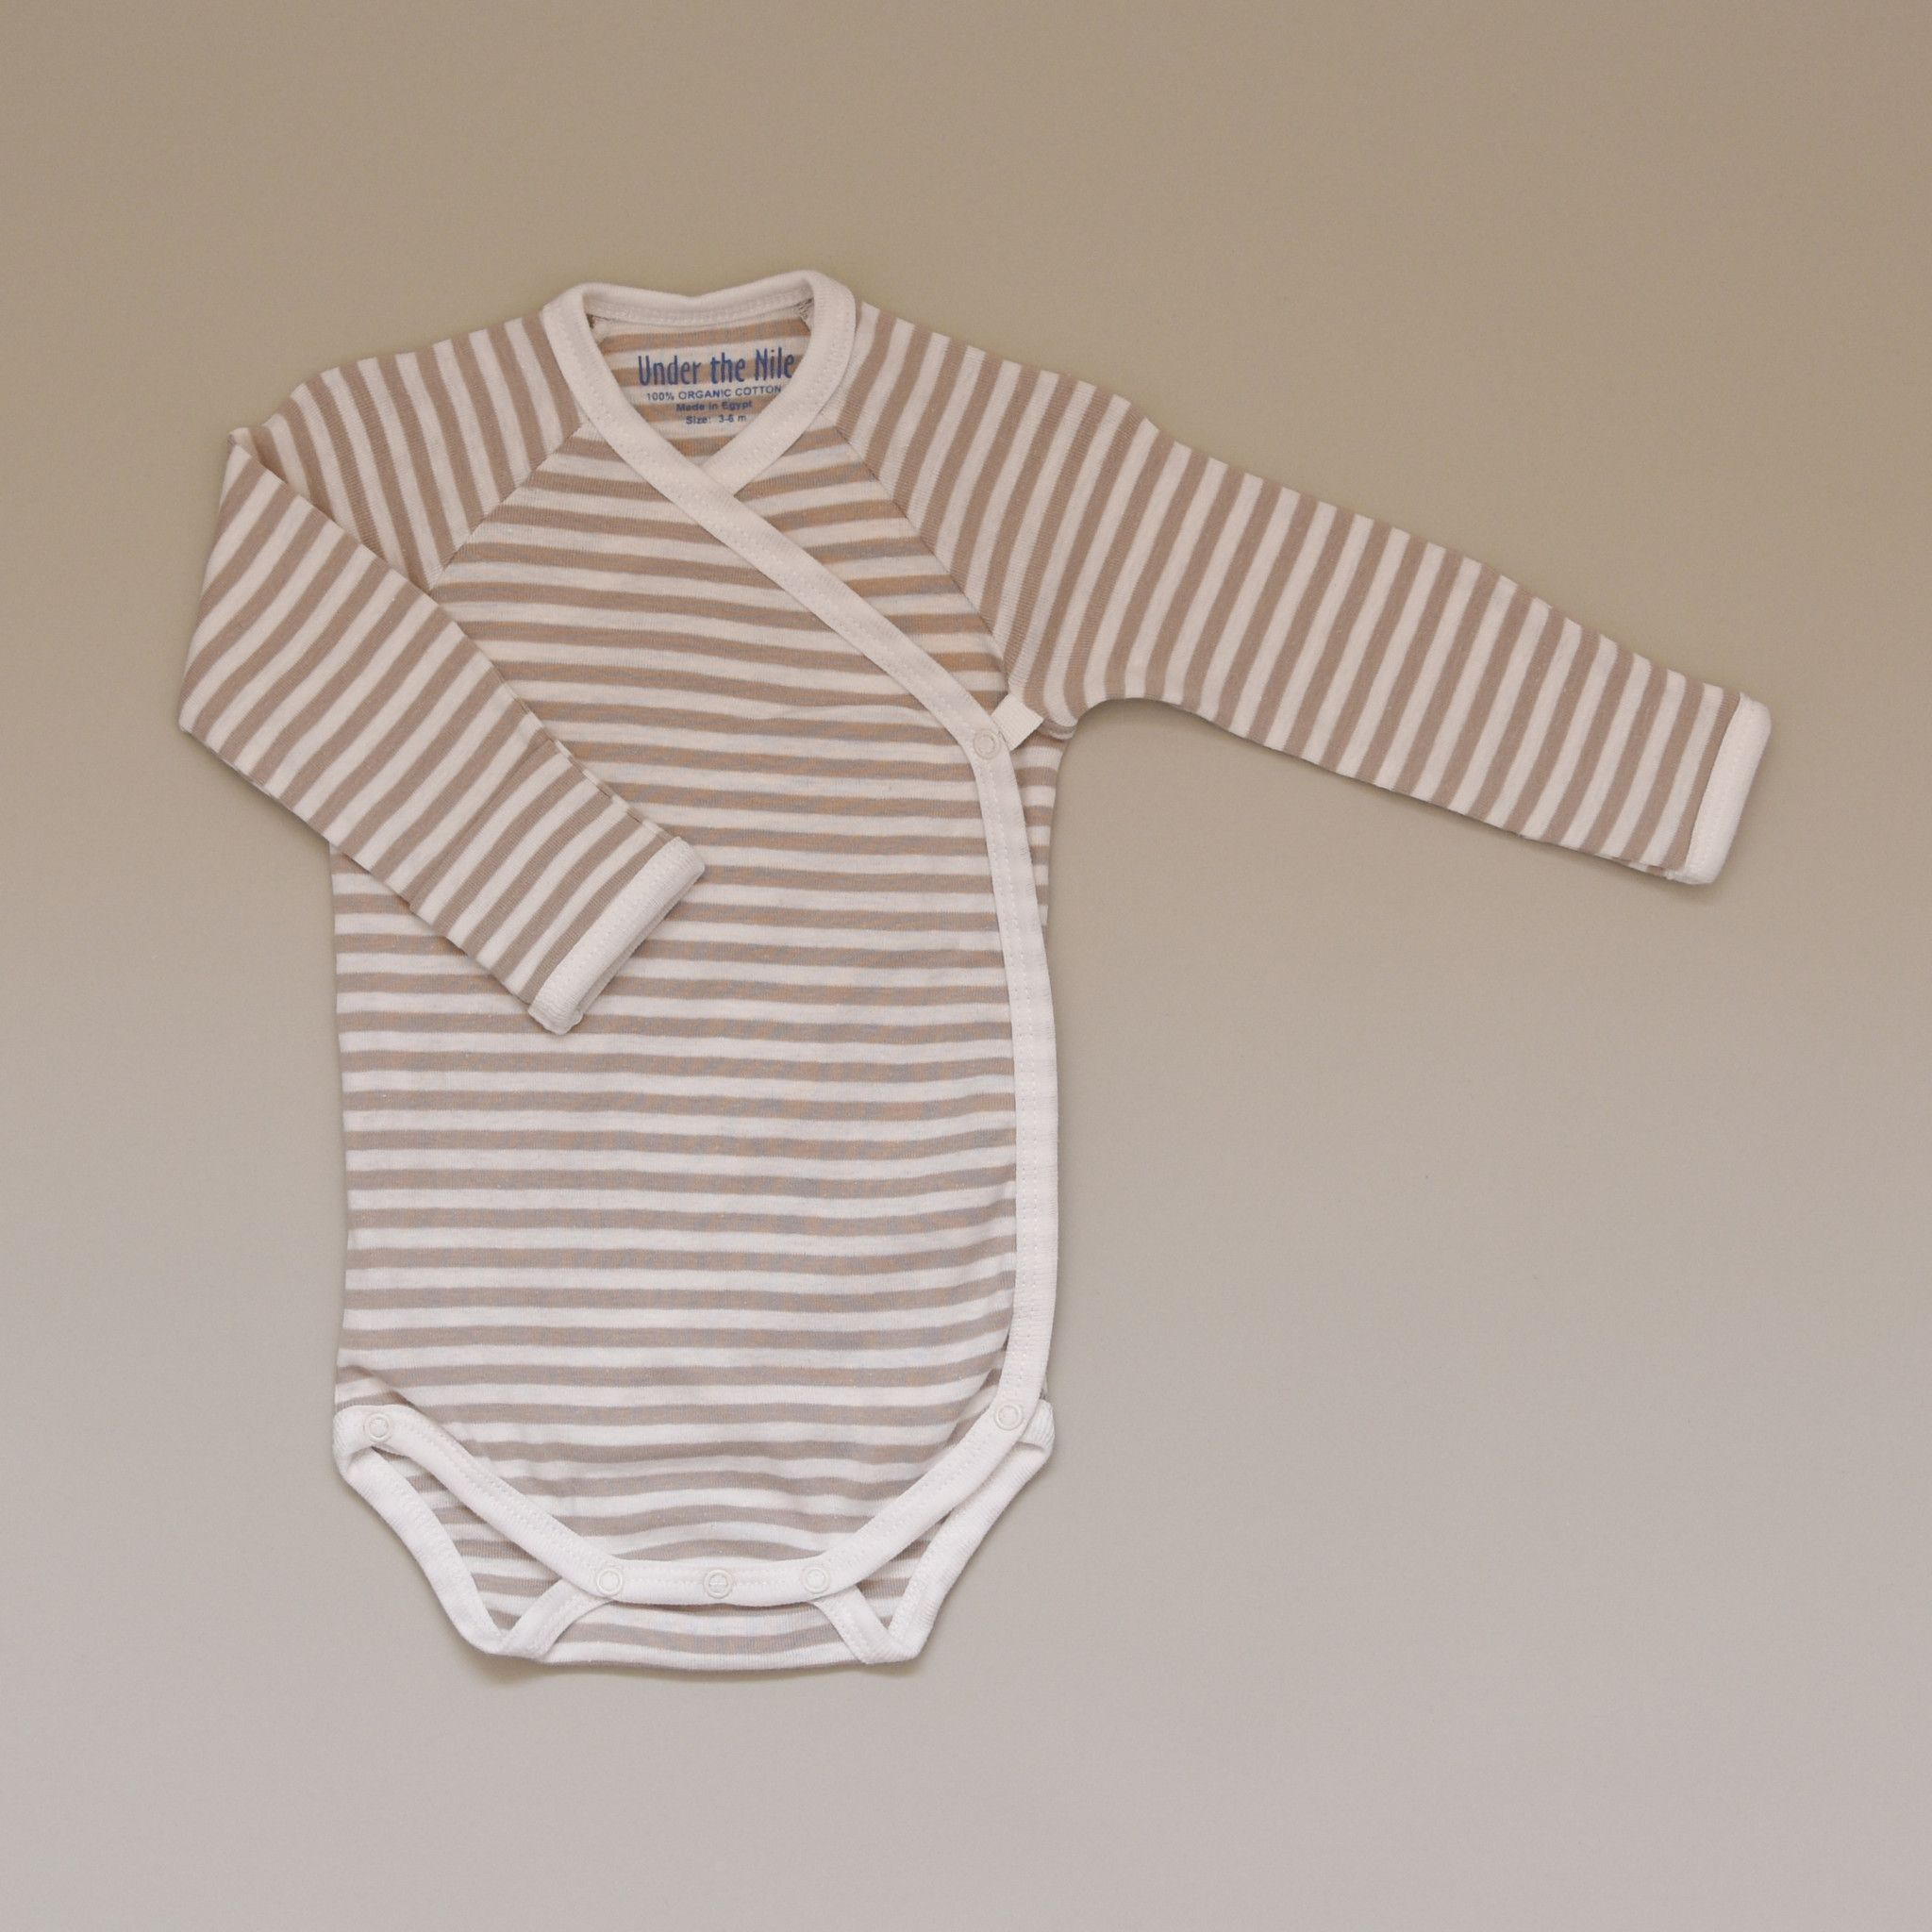 ddbb6627fe 100% Organic Cotton Baby Long Sleeve Tan and White Striped Bodysuit Onesie